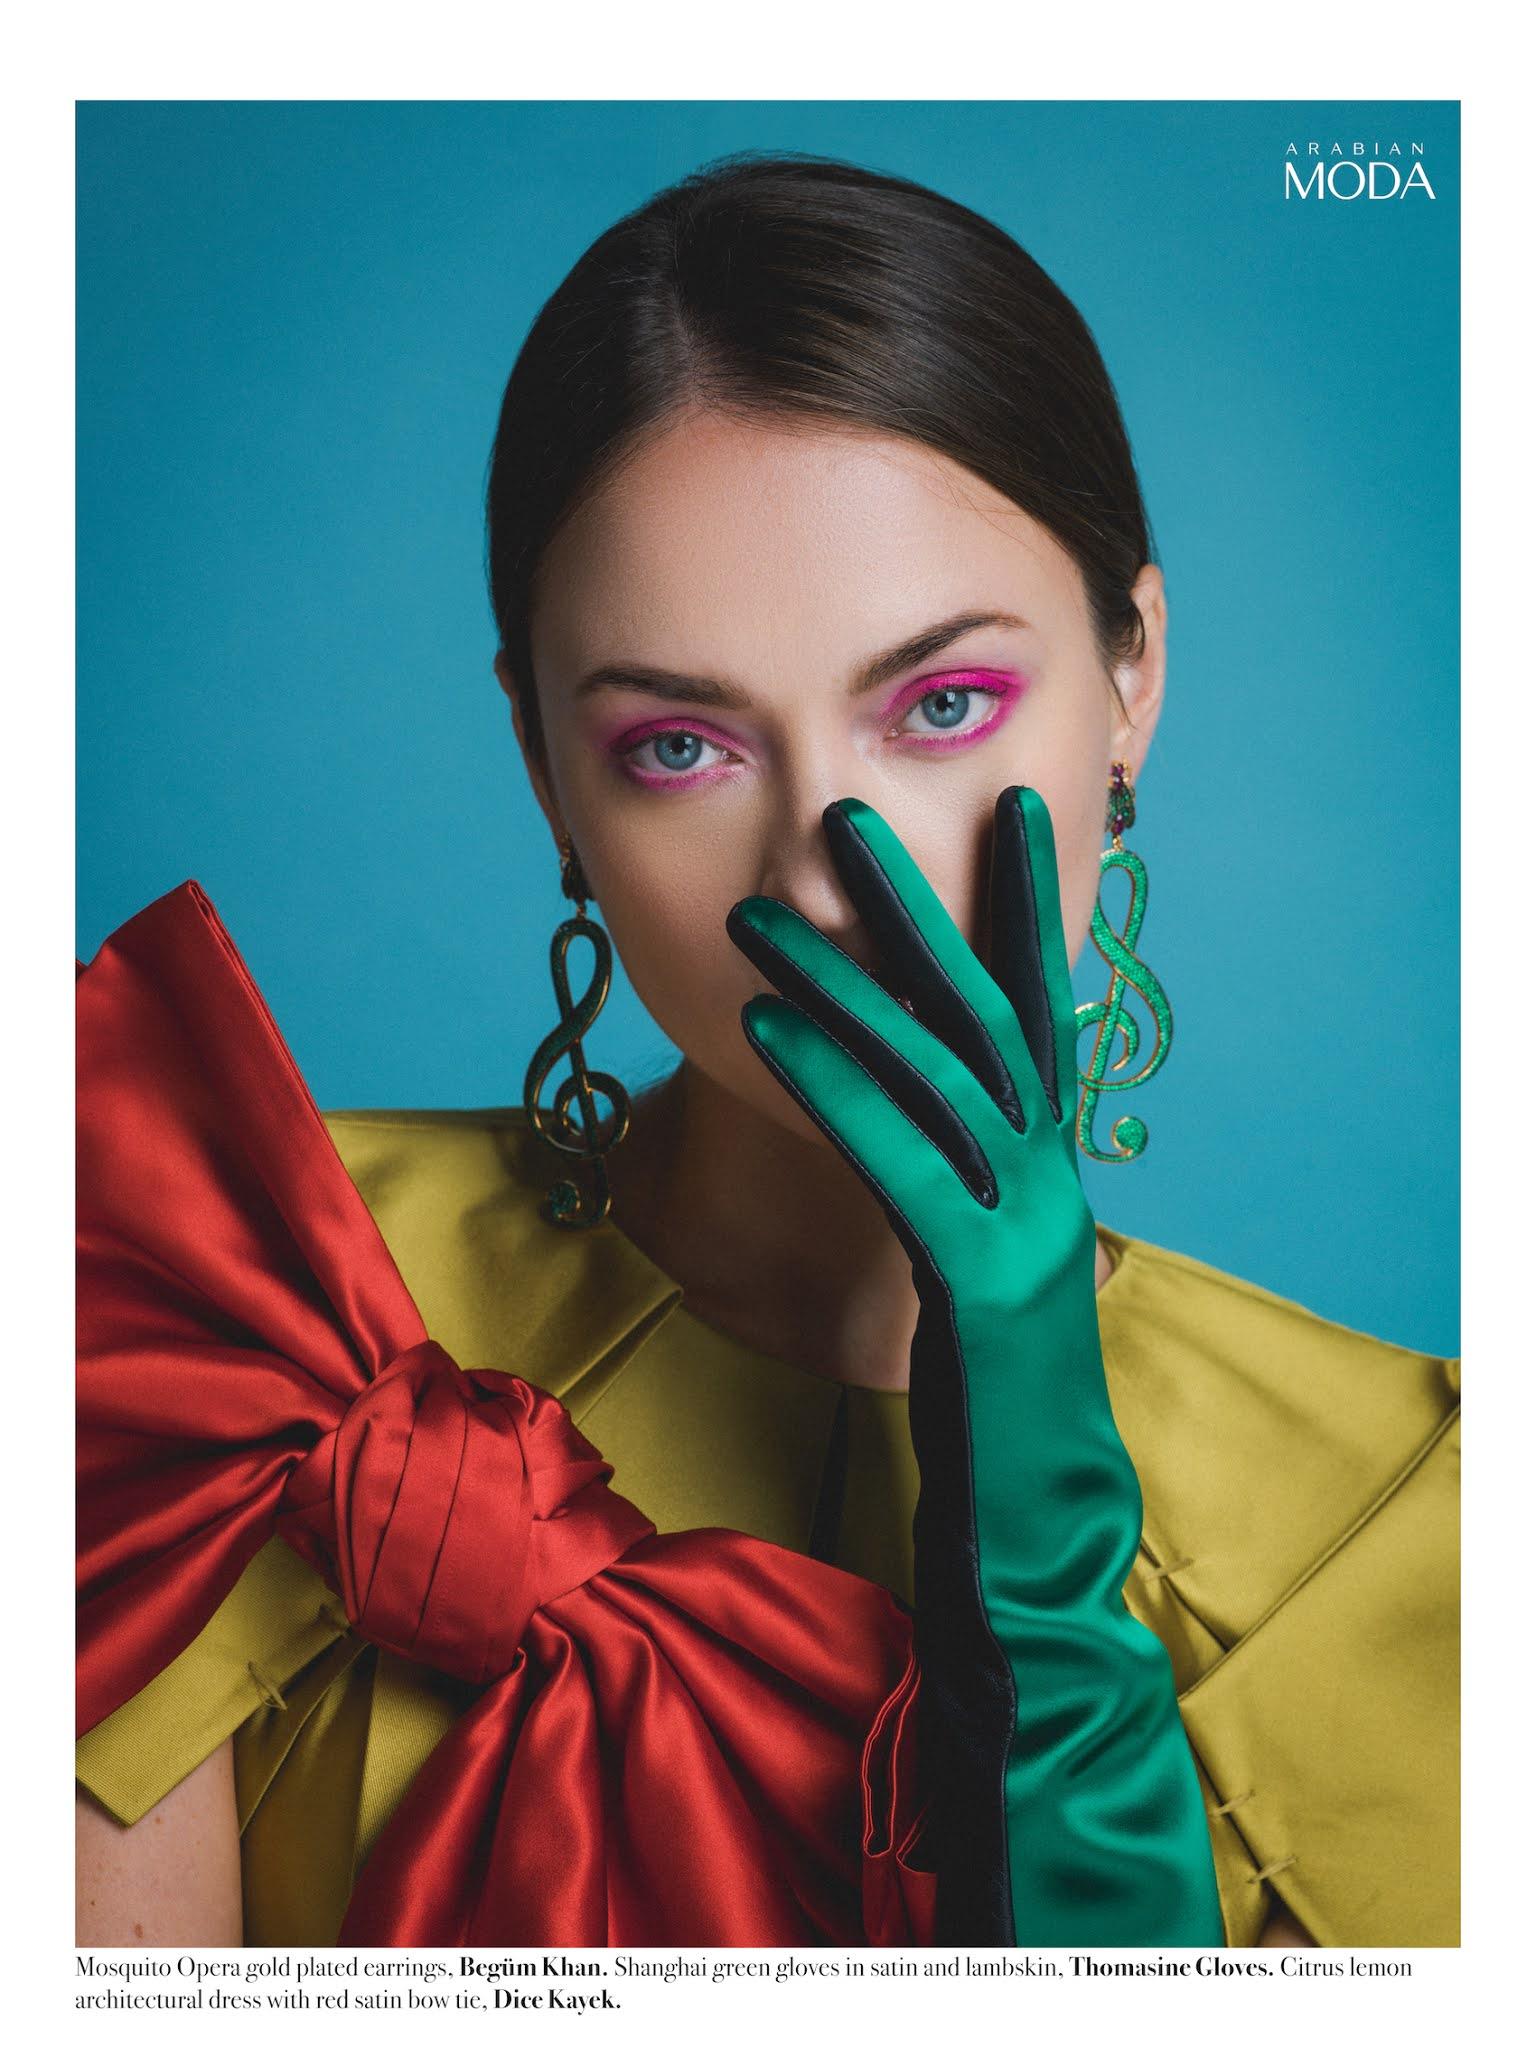 5- Arabian Moda x Begüm Khan x Thomasine Gloves x Dice Kayek